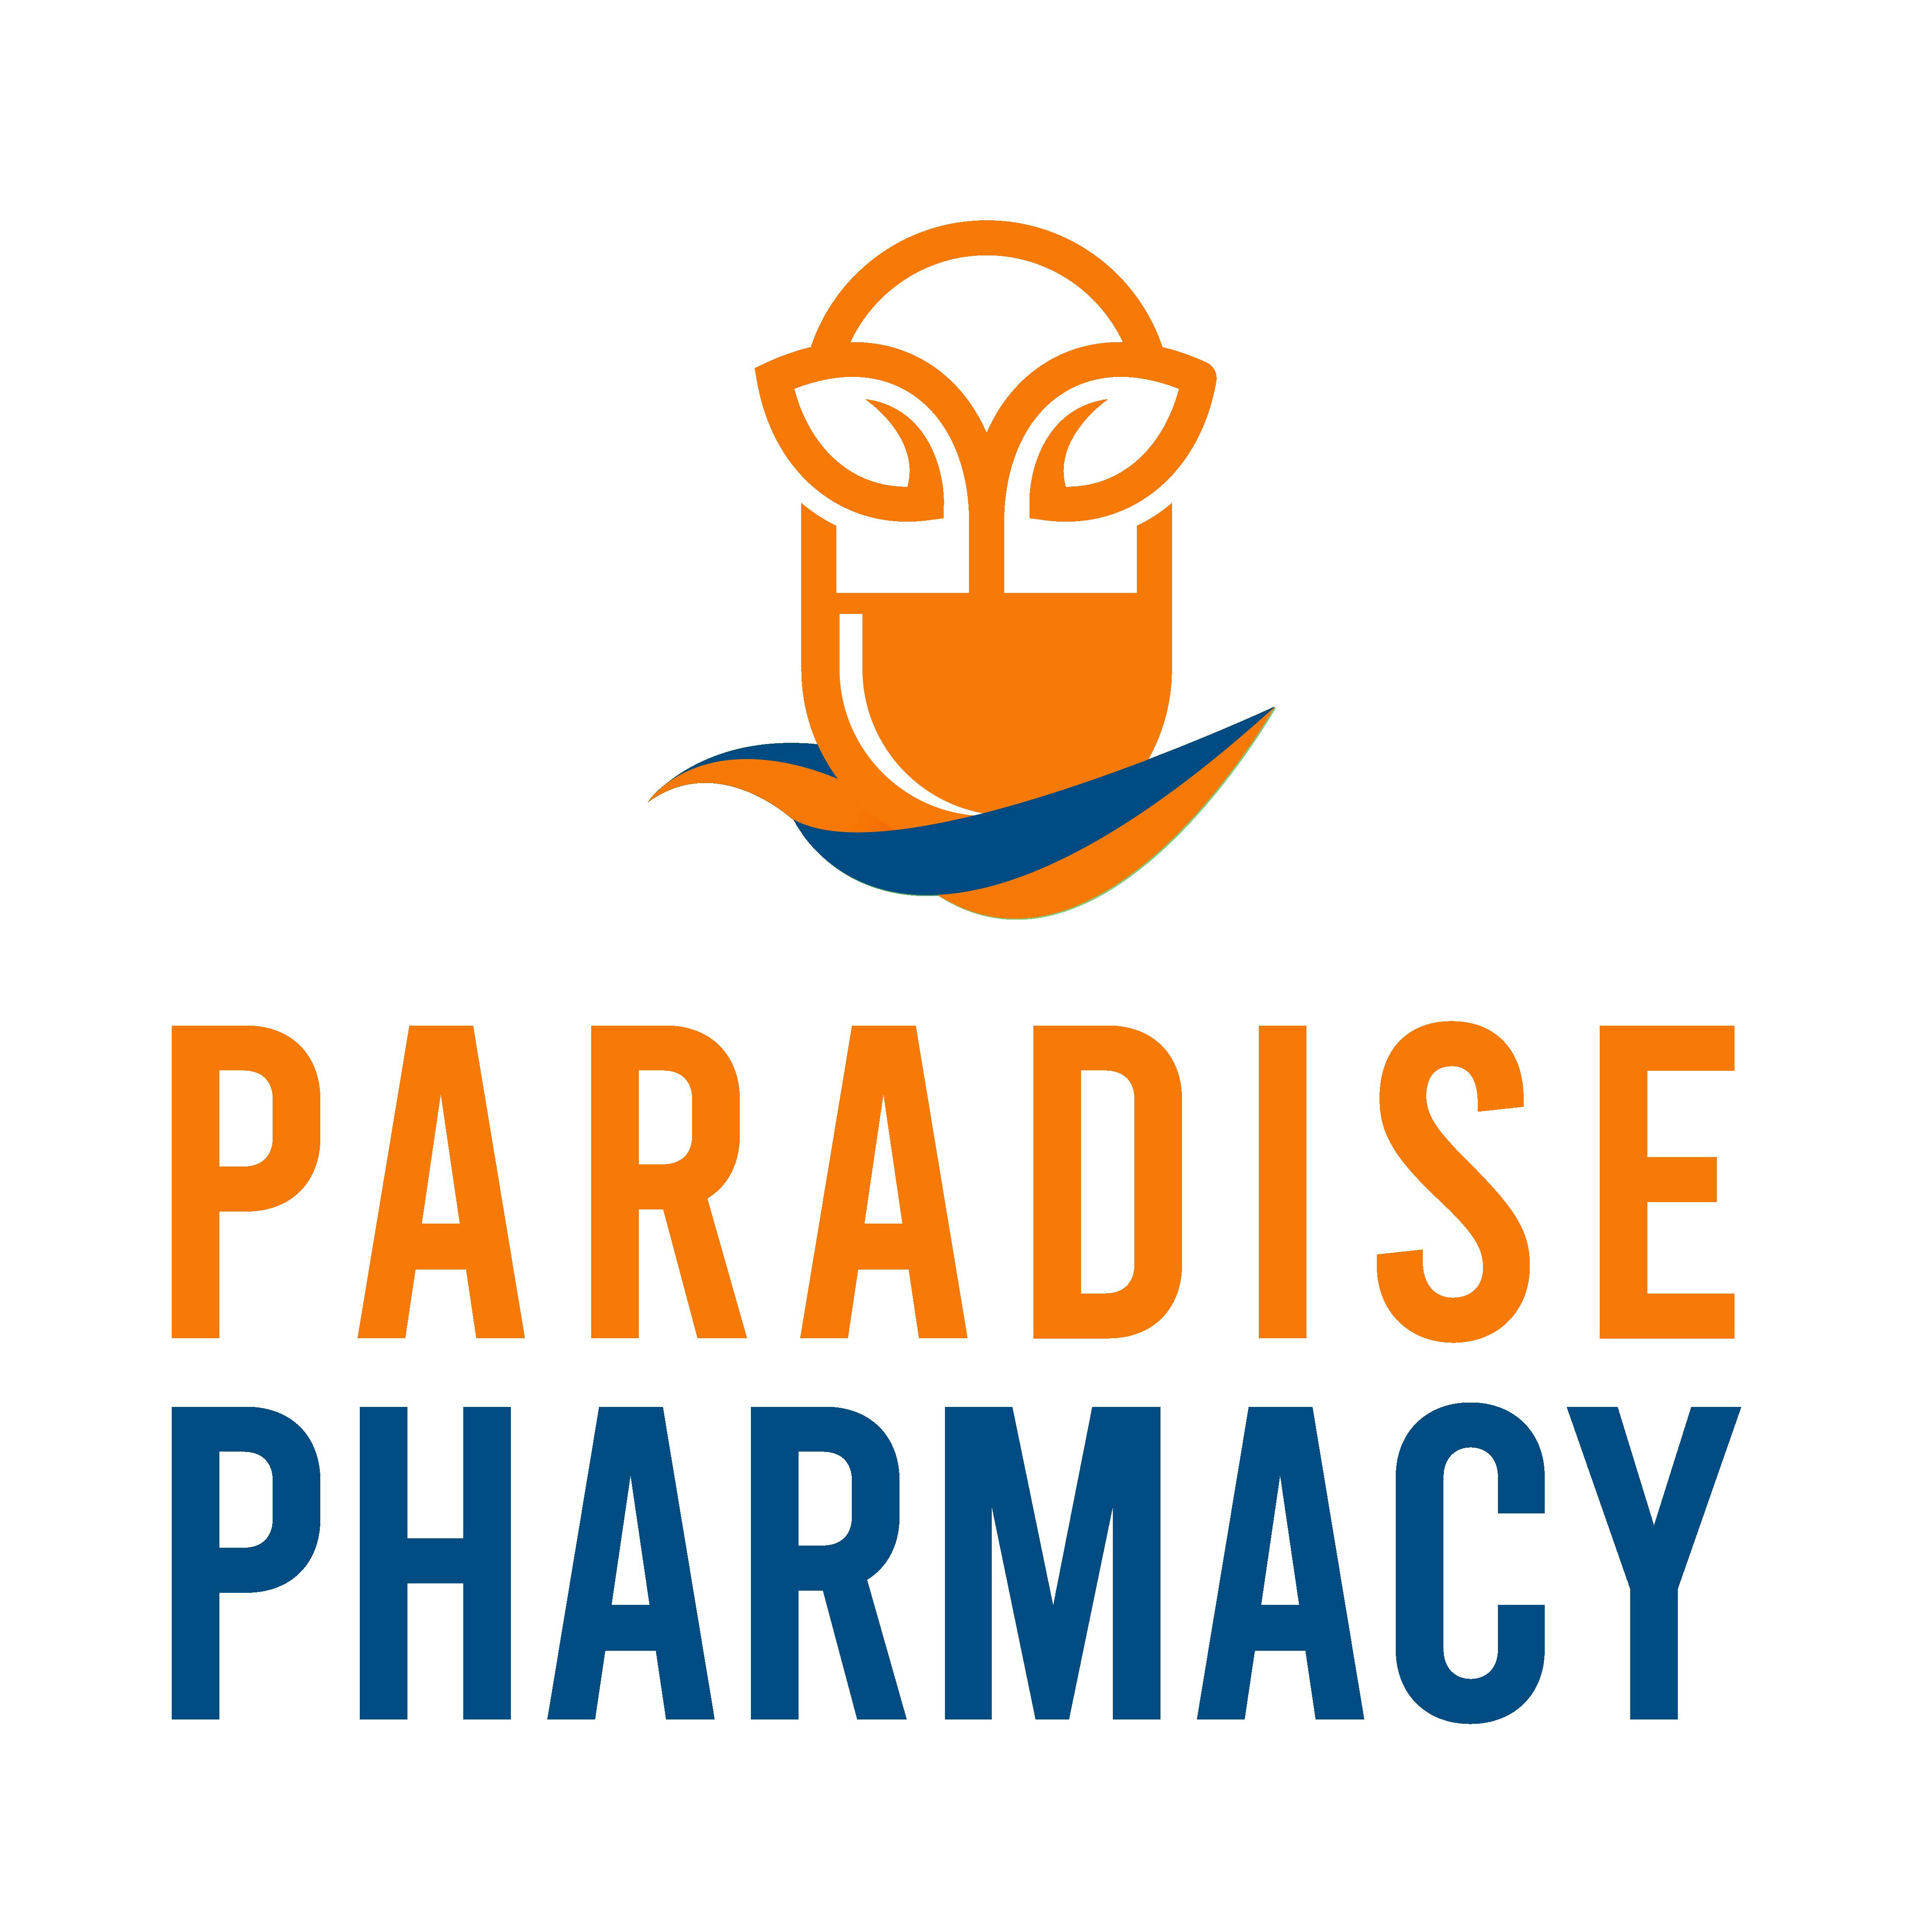 PARADISE PHARMACY